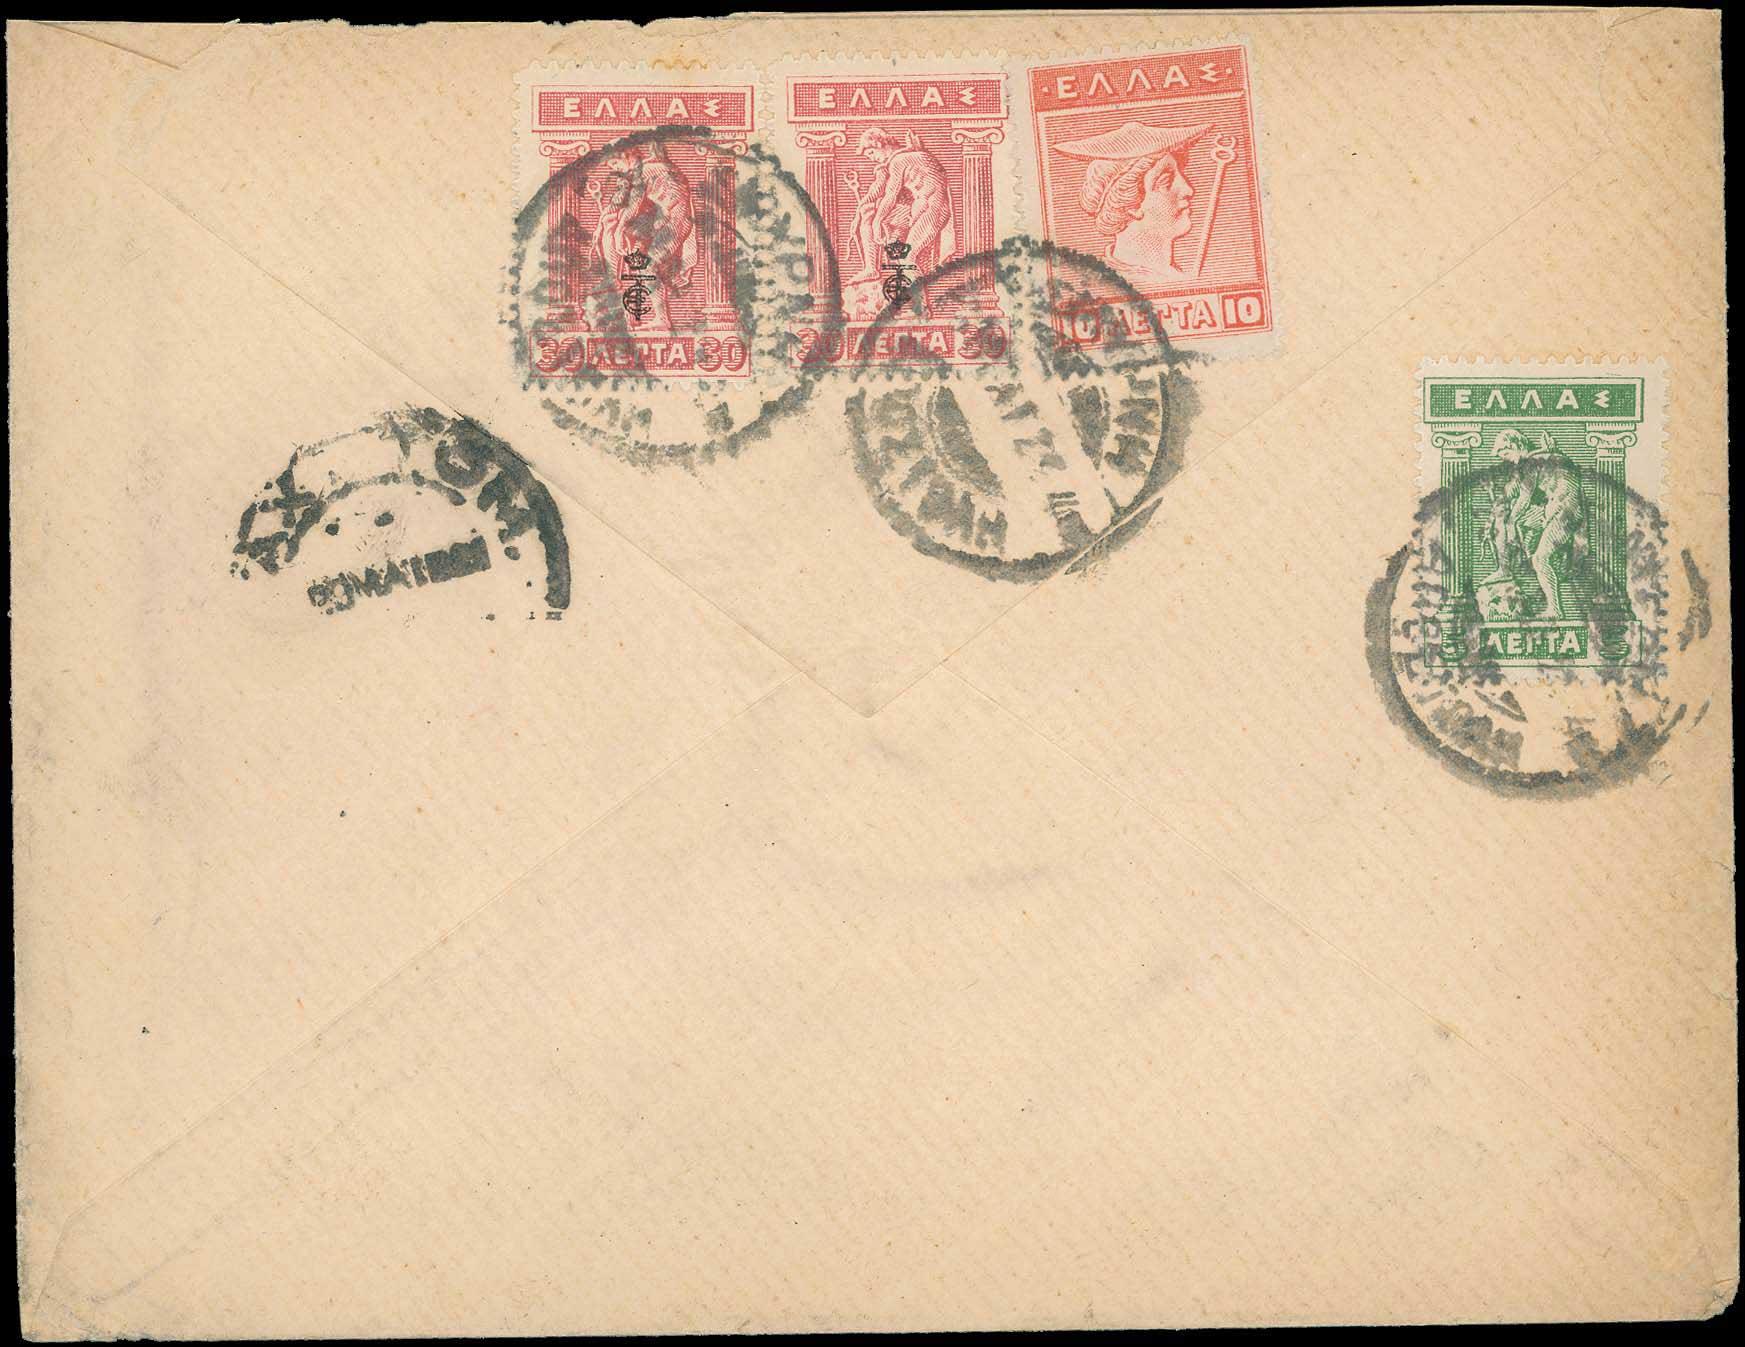 Lot 870 - -  SMYRNE,CONS/PLE & ASIA MINOR (before 1922) SMYRNE,CONS/PLE & ASIA MINOR (before 1922) -  A. Karamitsos Public & Live Internet Auction 675